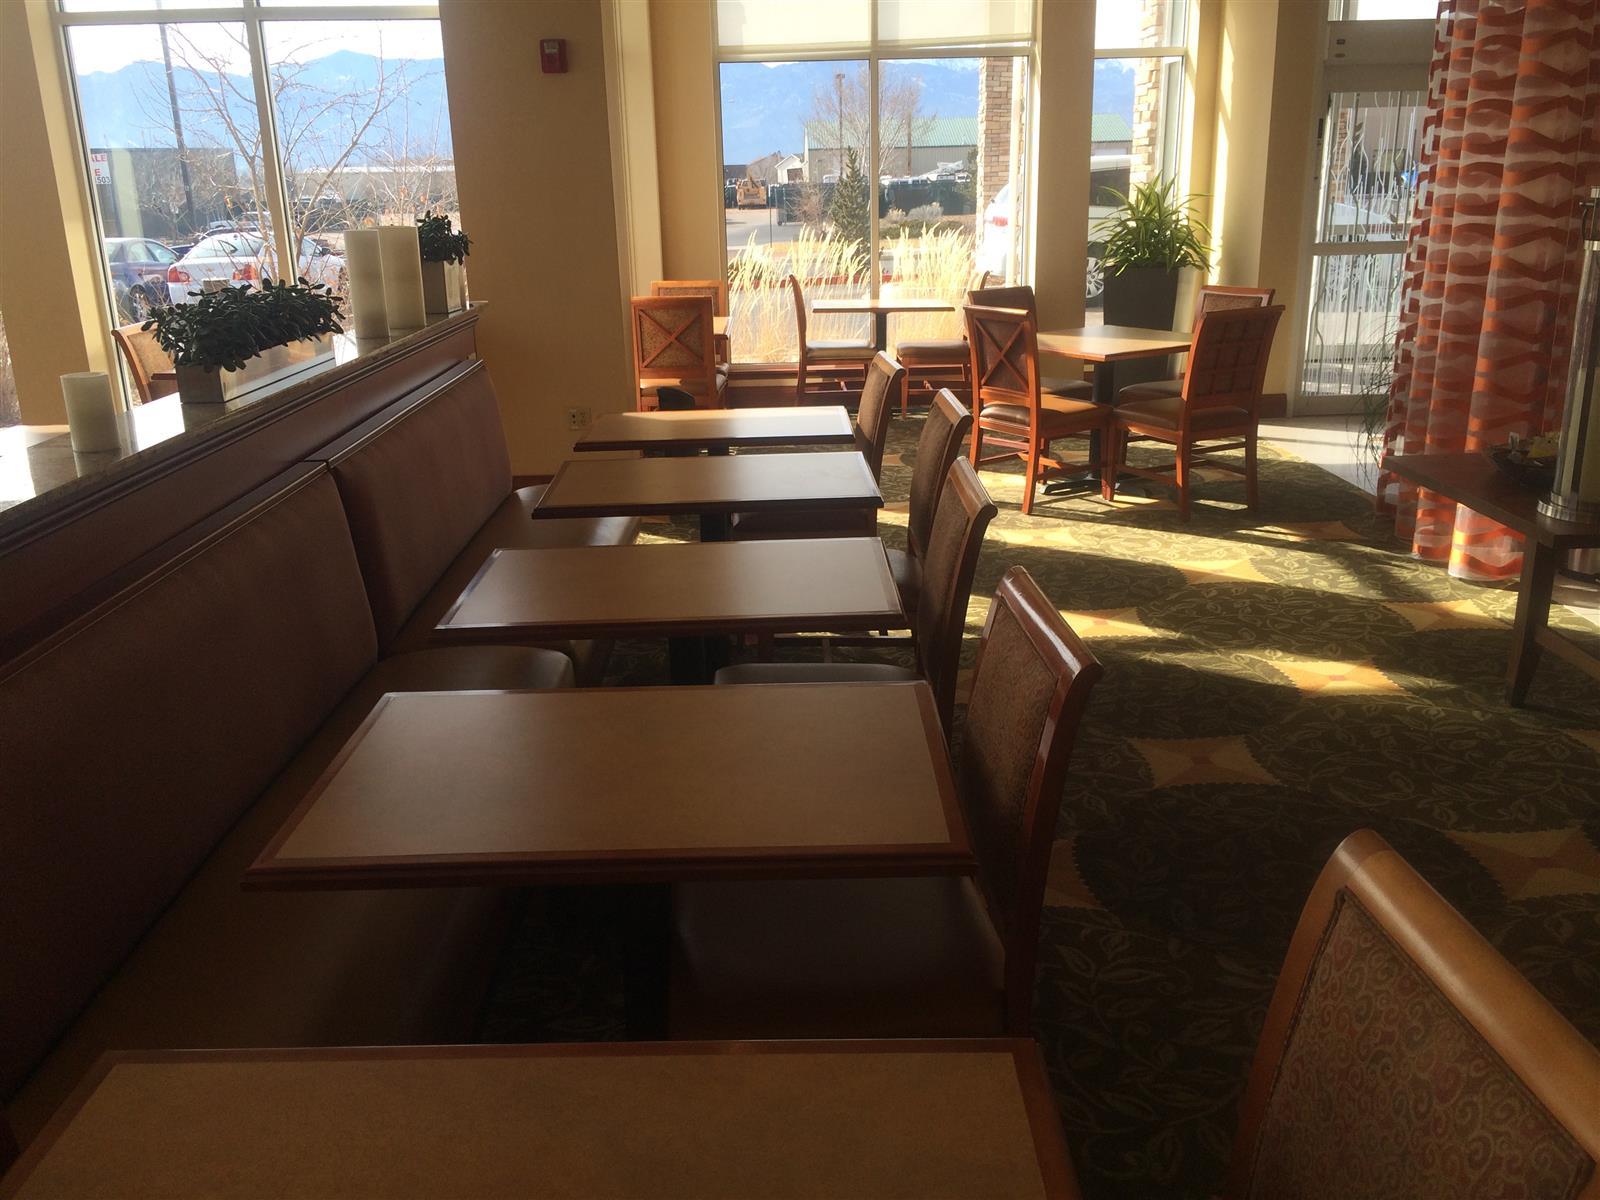 Hilton Garden Inn Colorado Springs Airport - Lobby Atrium - Space 2